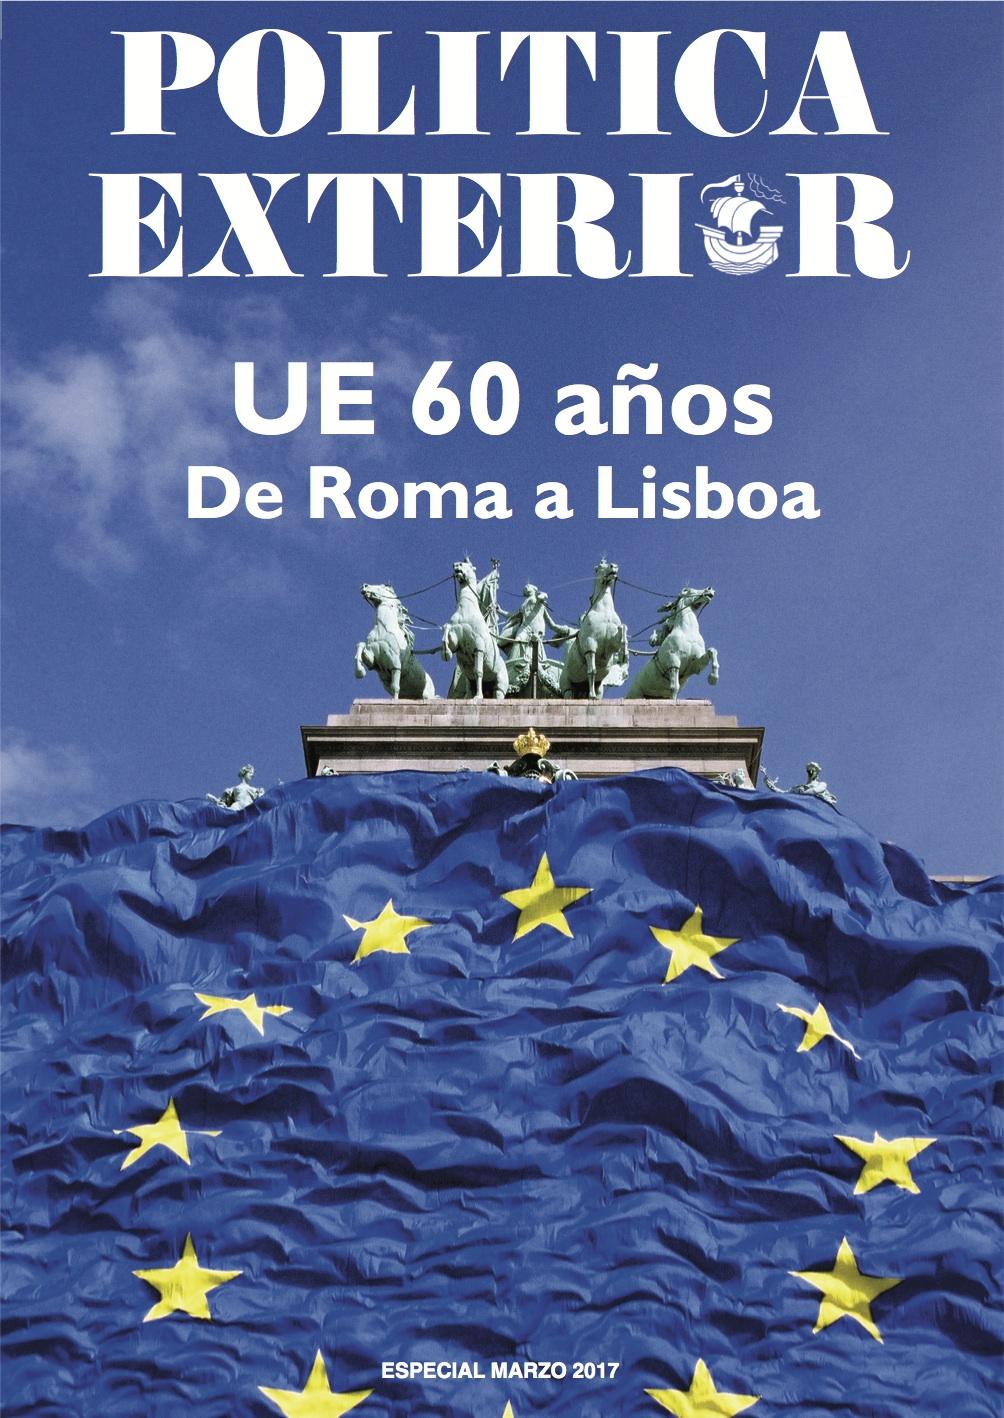 UE 60 años: De Roma a Lisboa